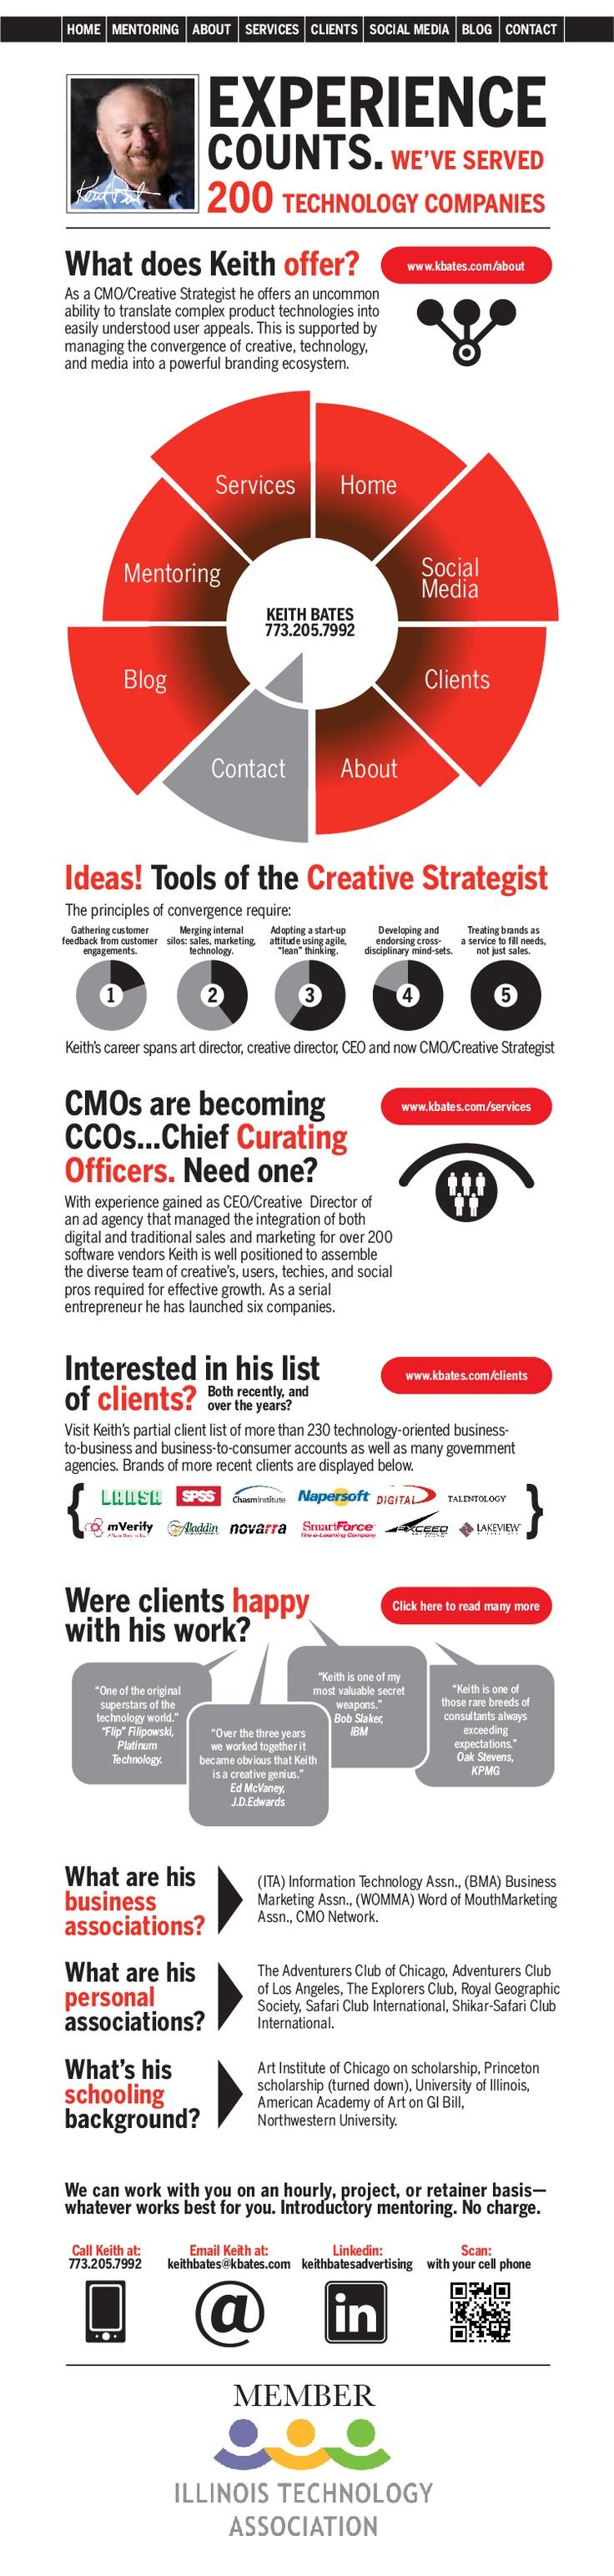 Keith Bates Creative Strategist infographic resume